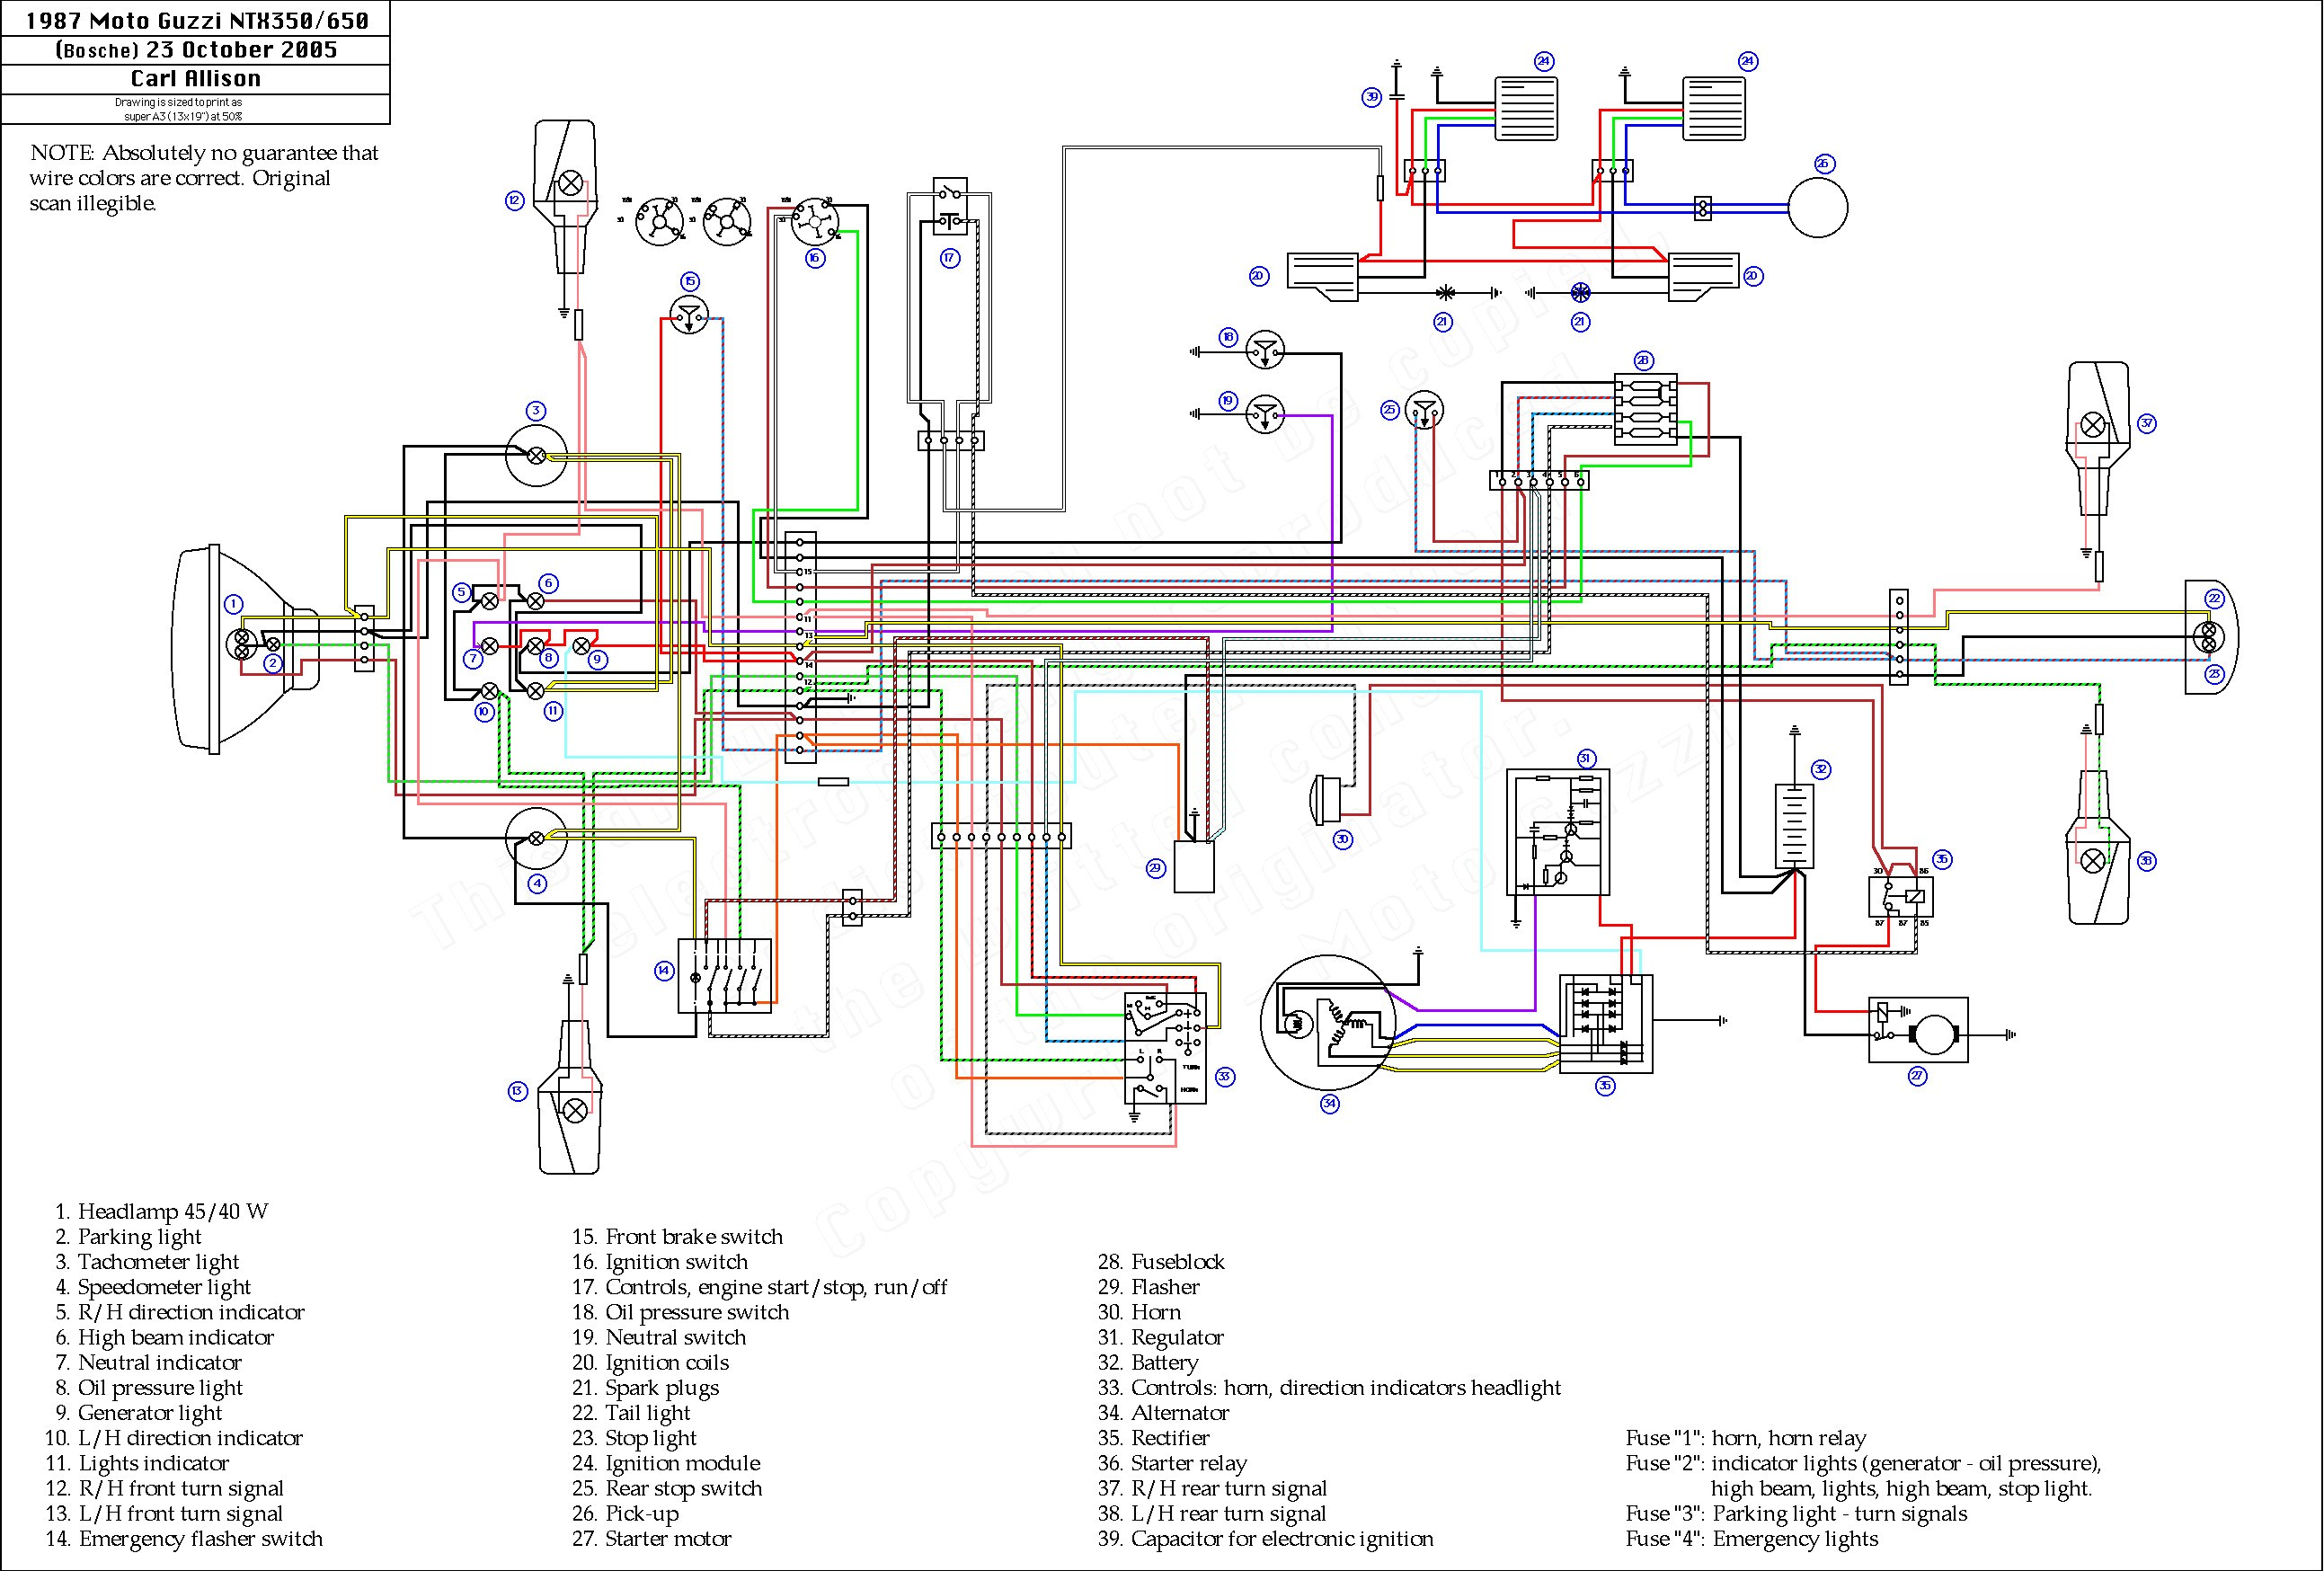 Motorcycle Rectifier Regulator Plug Schematic Electrical Wiring Gy6 Diagram Image Voltage Random 2 Yamaha 350